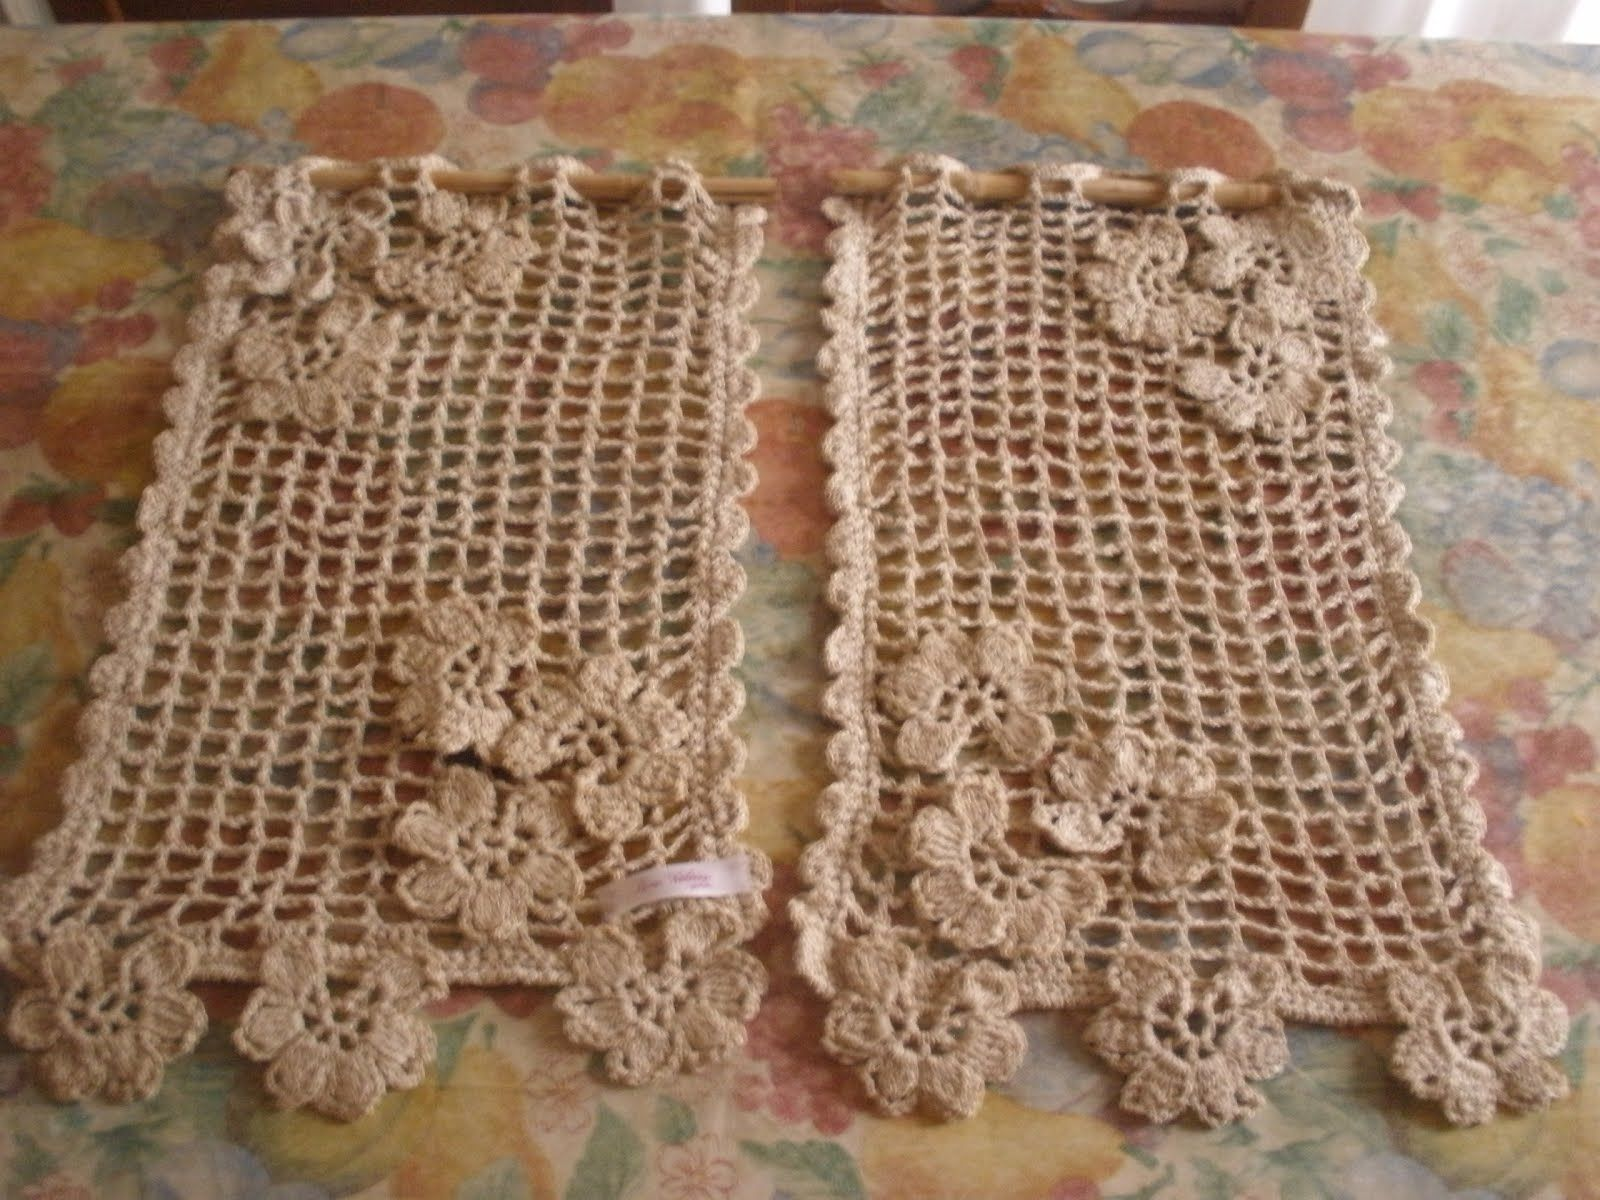 Cortinas tejidas al crochet tejido 2 pinterest - Tejidos de cortinas ...